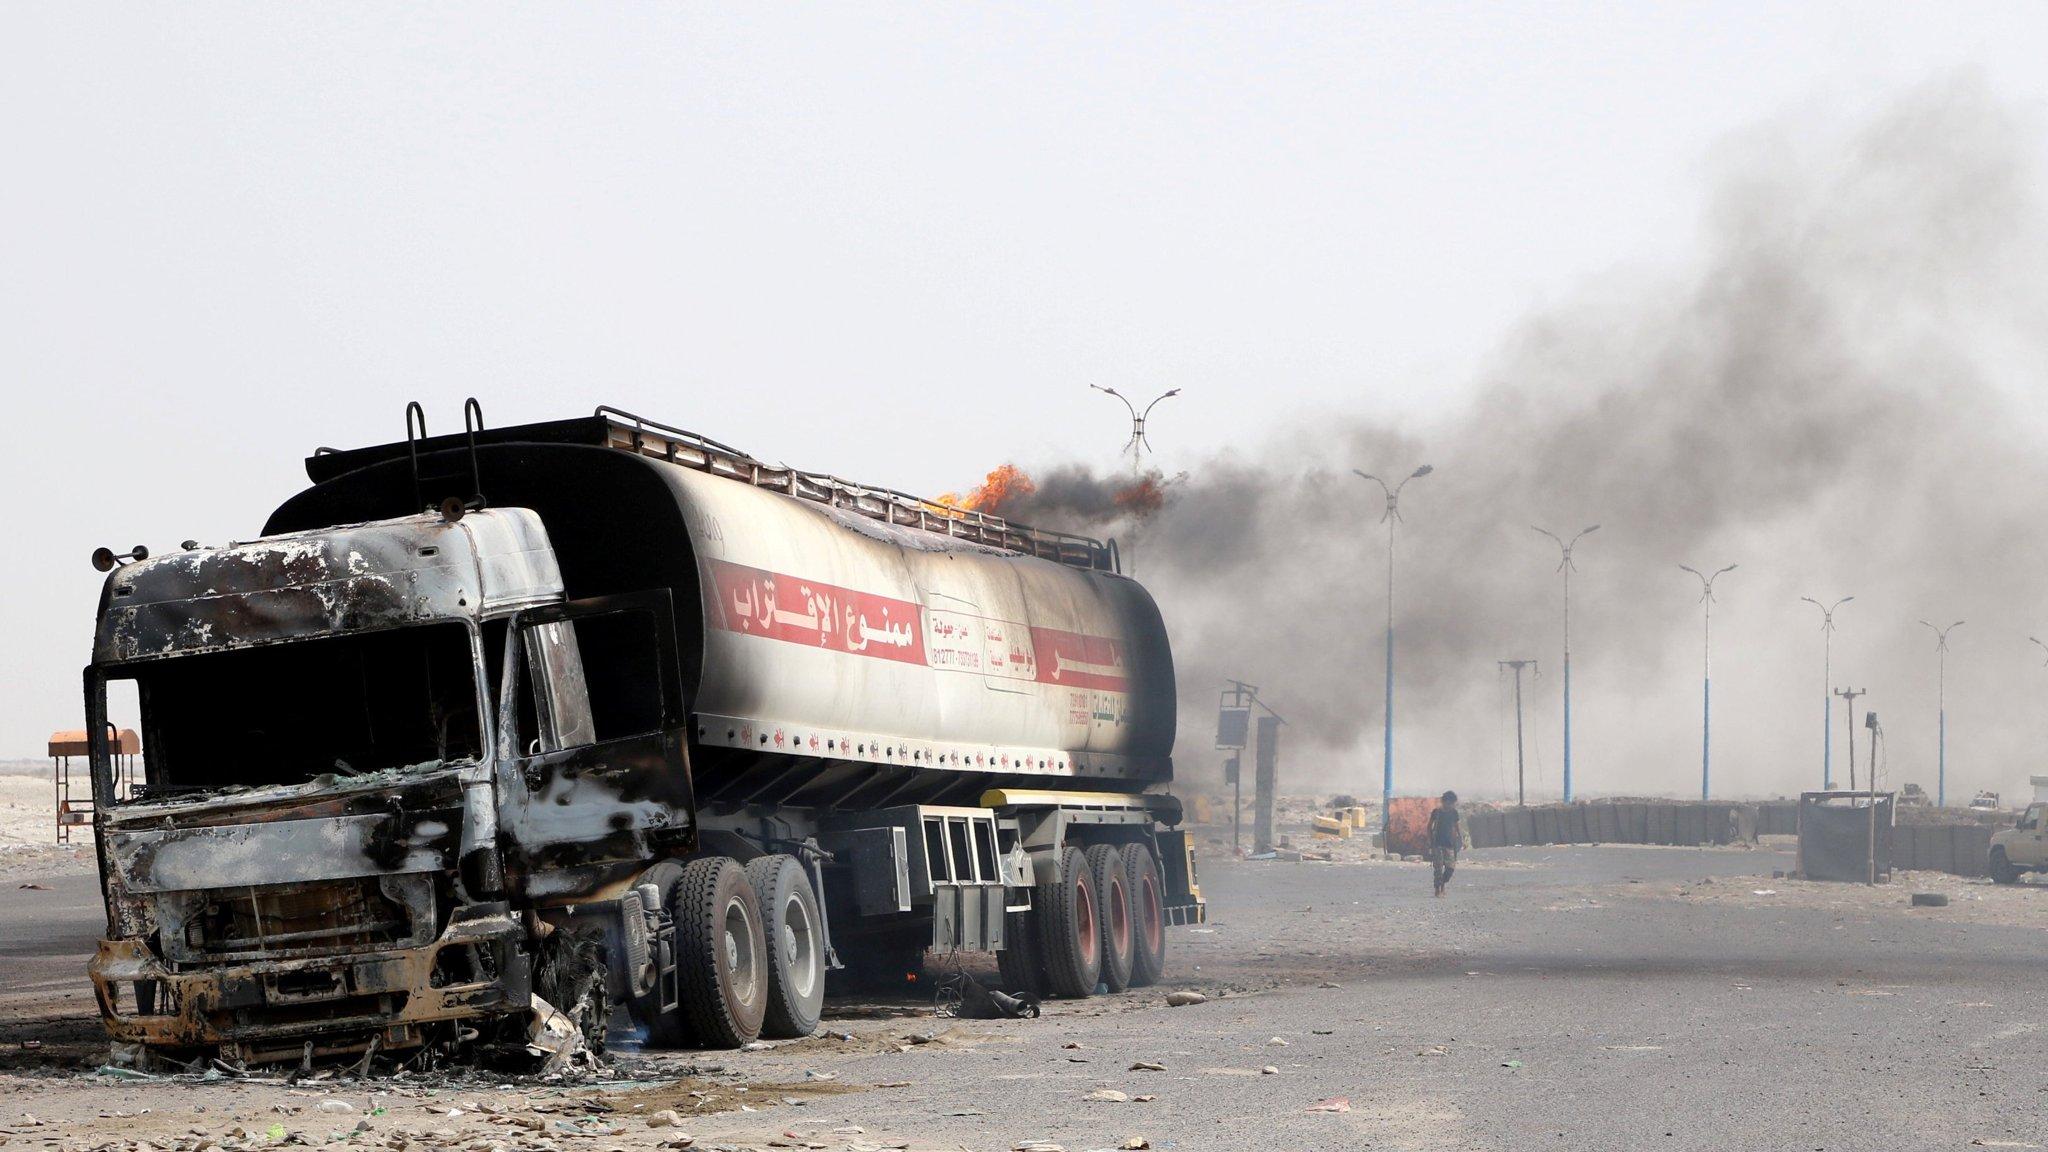 UAE attacks on Yemen reveal fractures in Saudi-led coalition